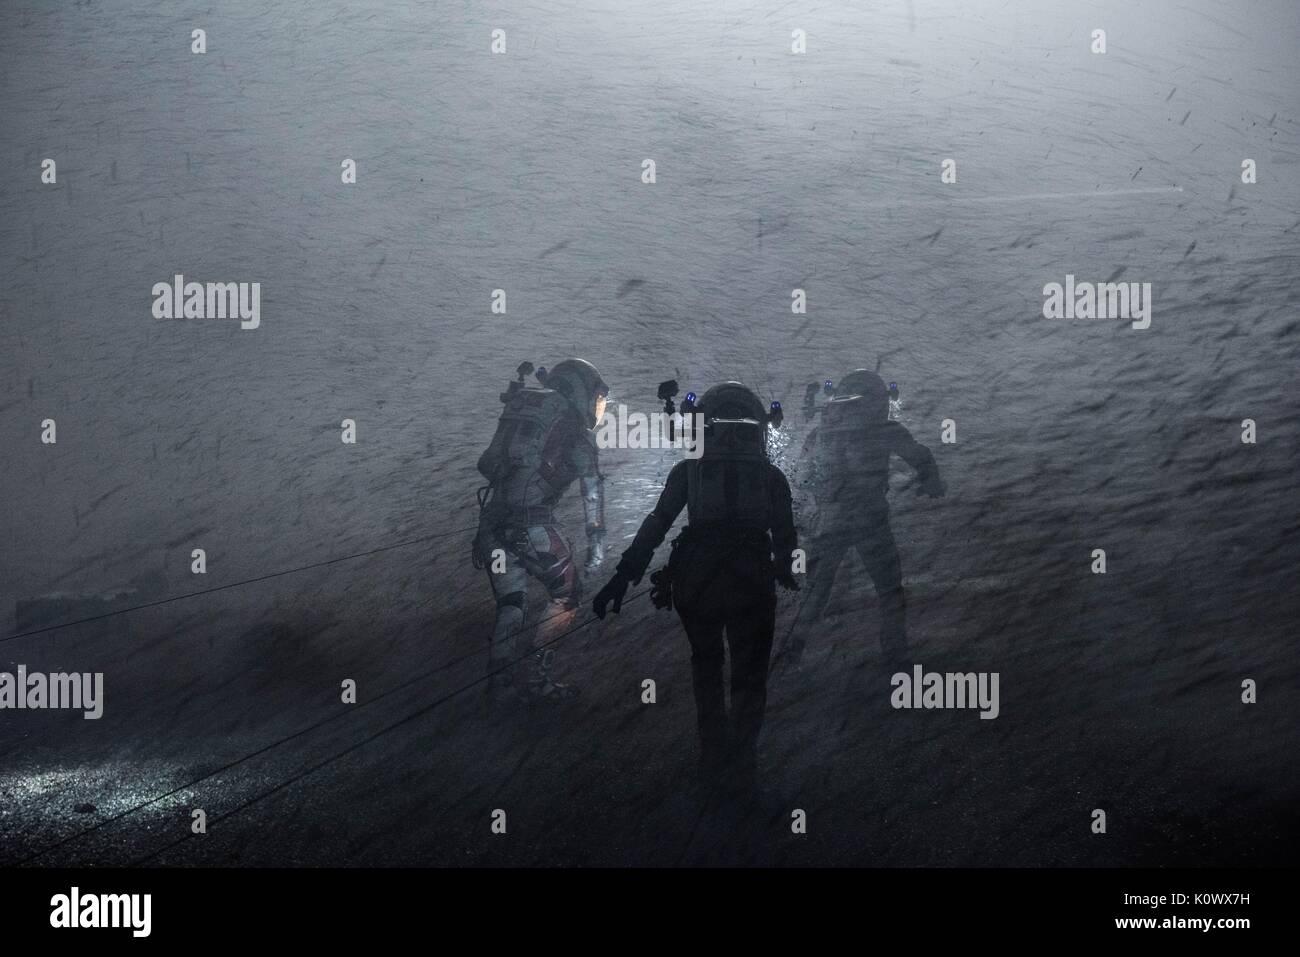 ASTRONAUTS THE MARTIAN (2015) - Stock Image